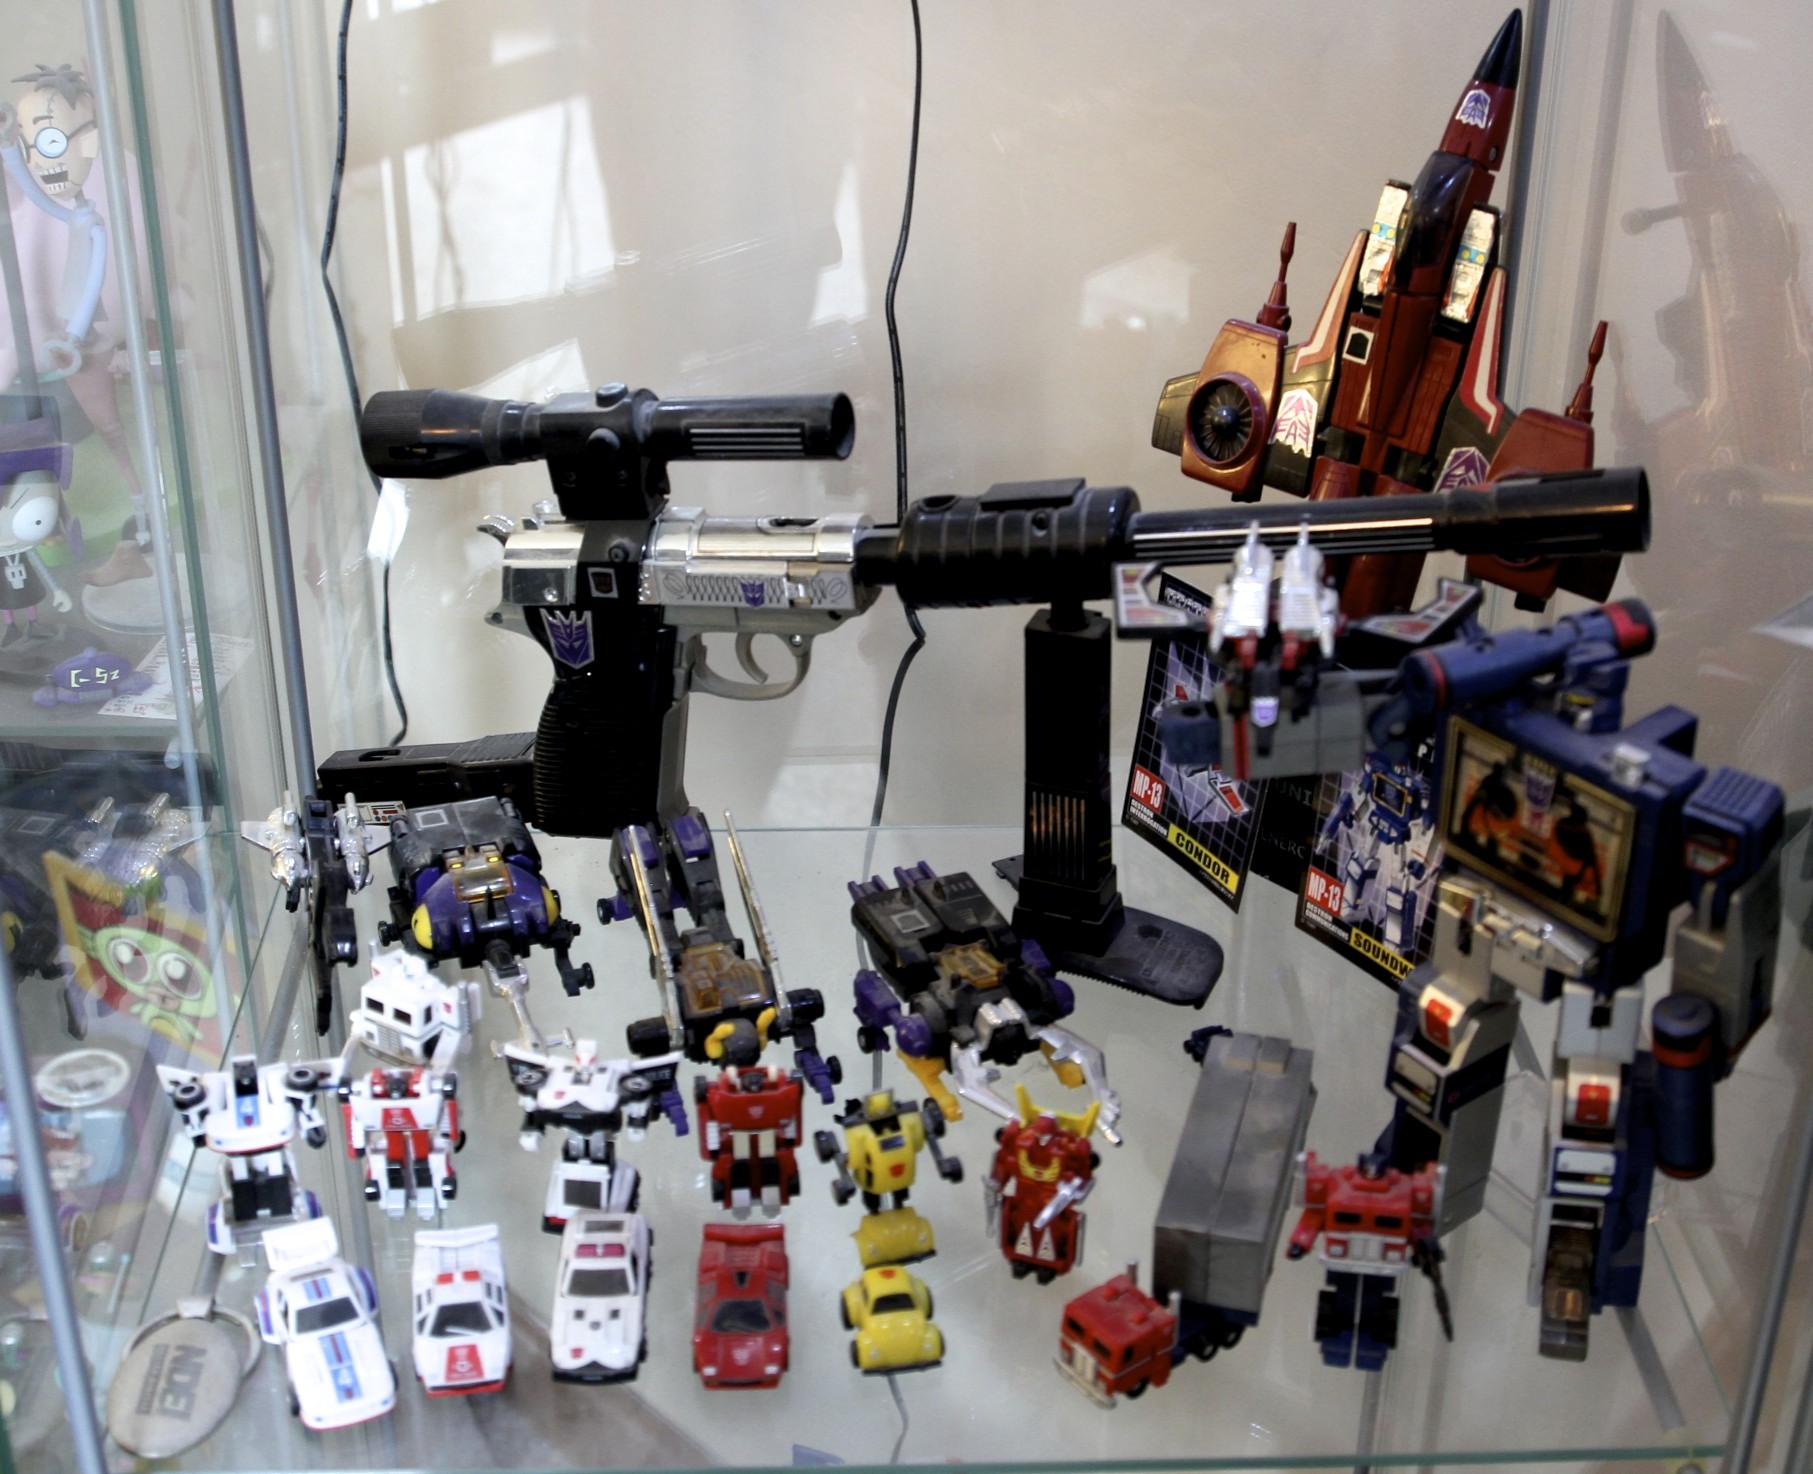 Megatron, Thrust, Soundwave, Laserbeak, Ravage, Insecticons, Micro Transformers.